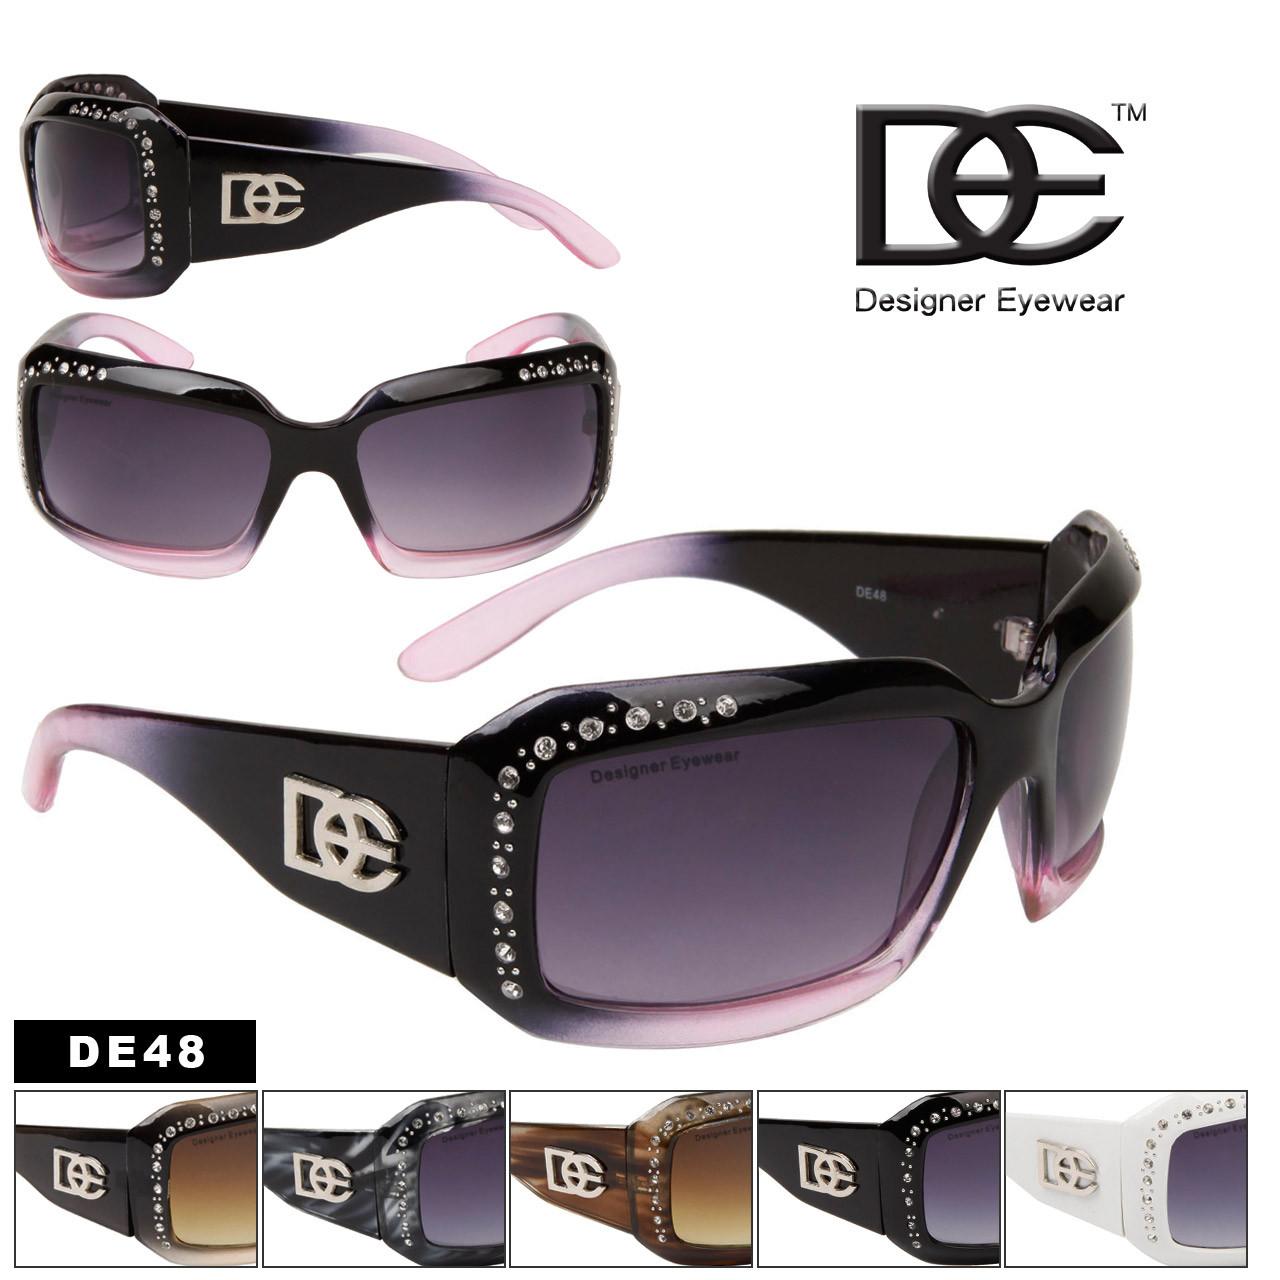 Rhinestone Sunglasses by DE™ Designer Eyewear DE48